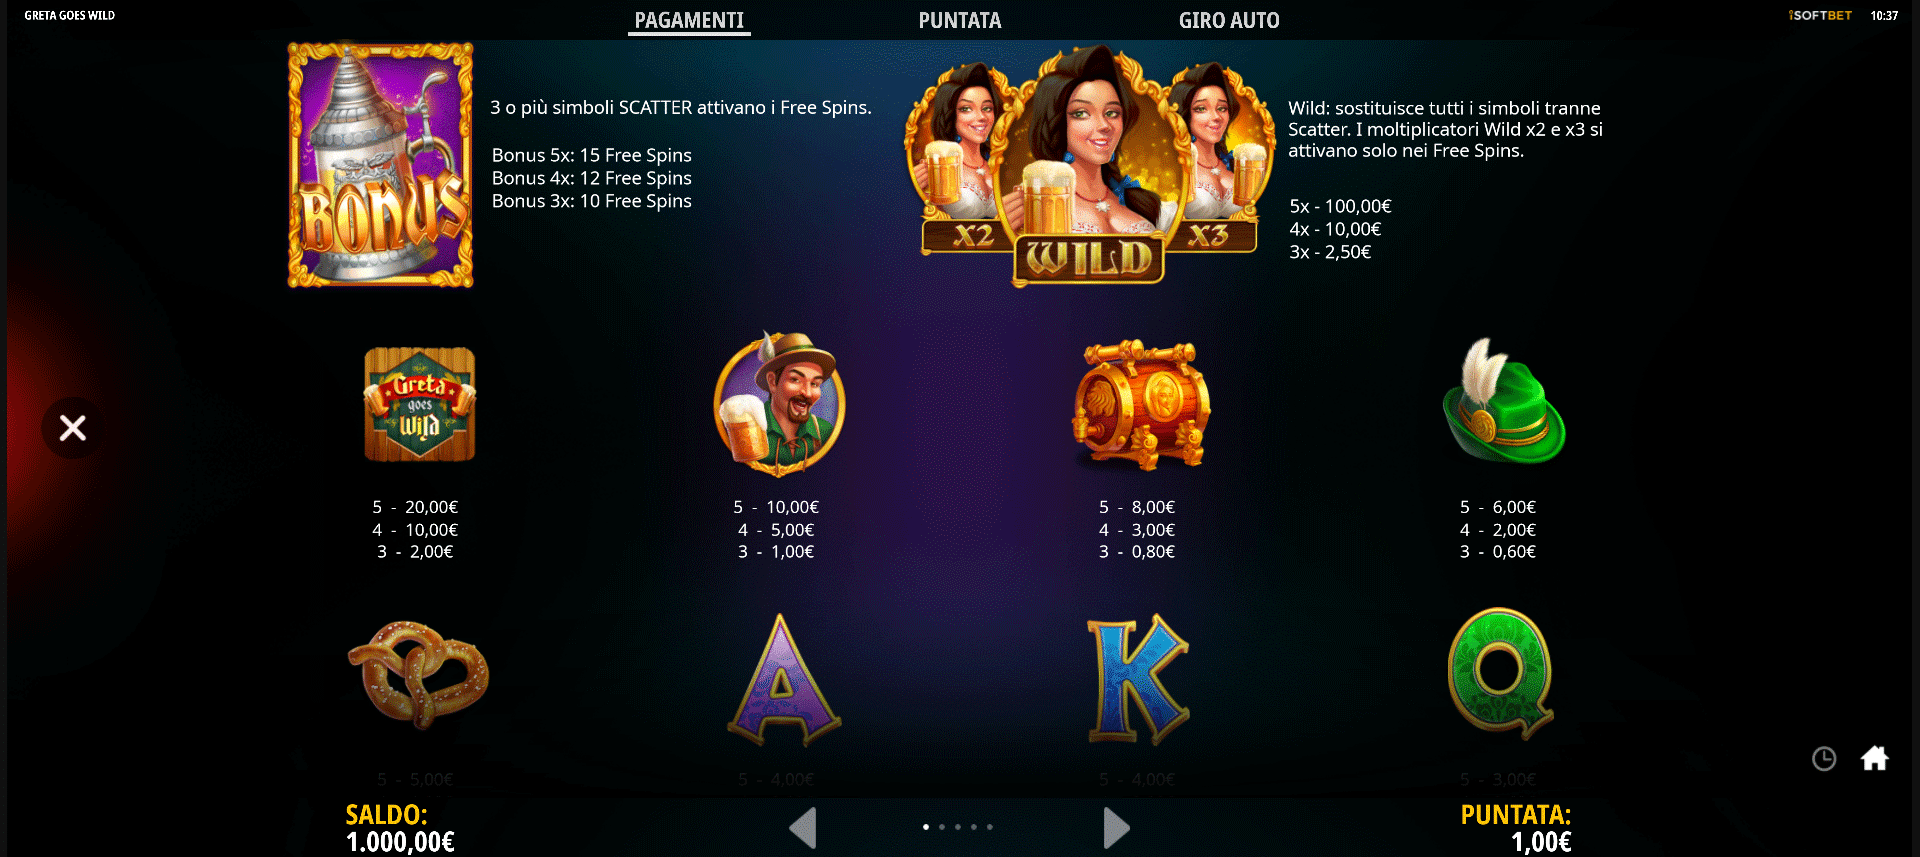 paytable della slot machine greta goes wild